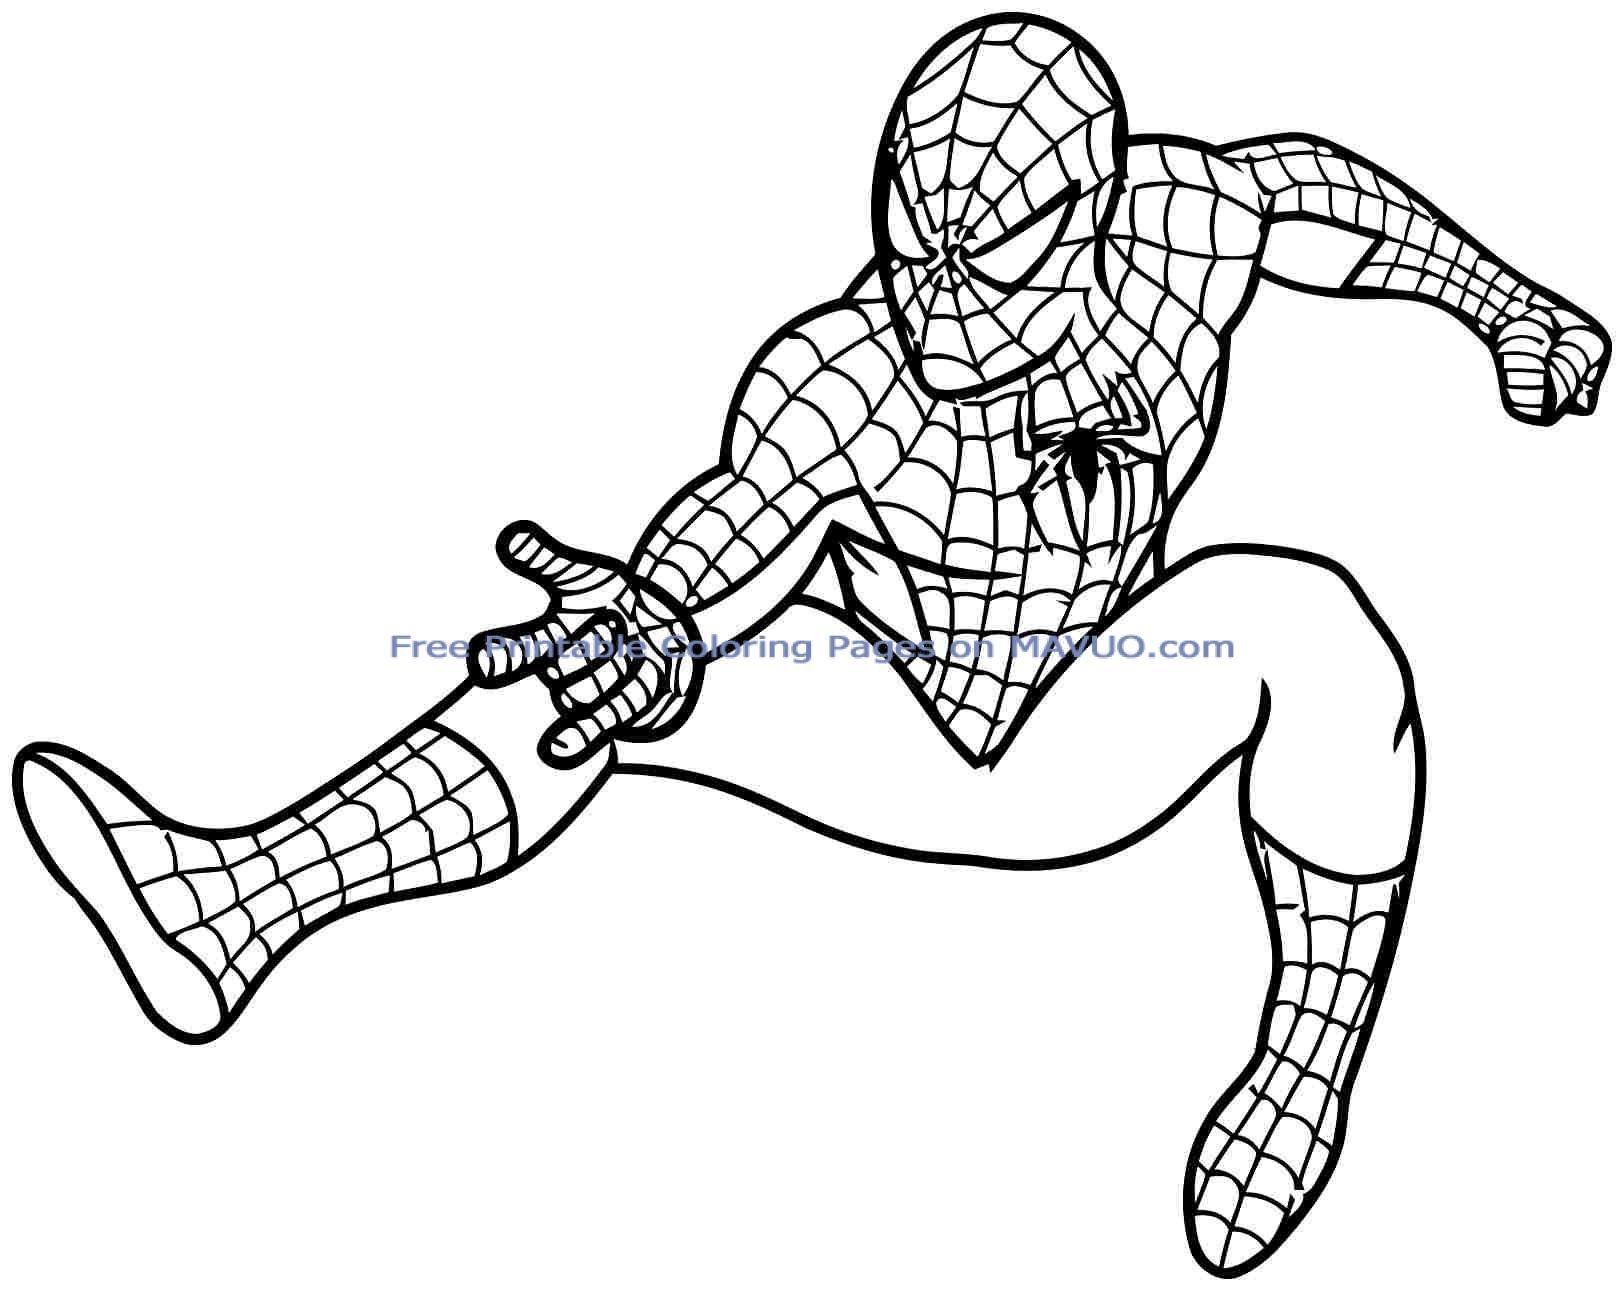 Superhero Coloring Books Free Coloring Pages Spiderman Warna Kartun